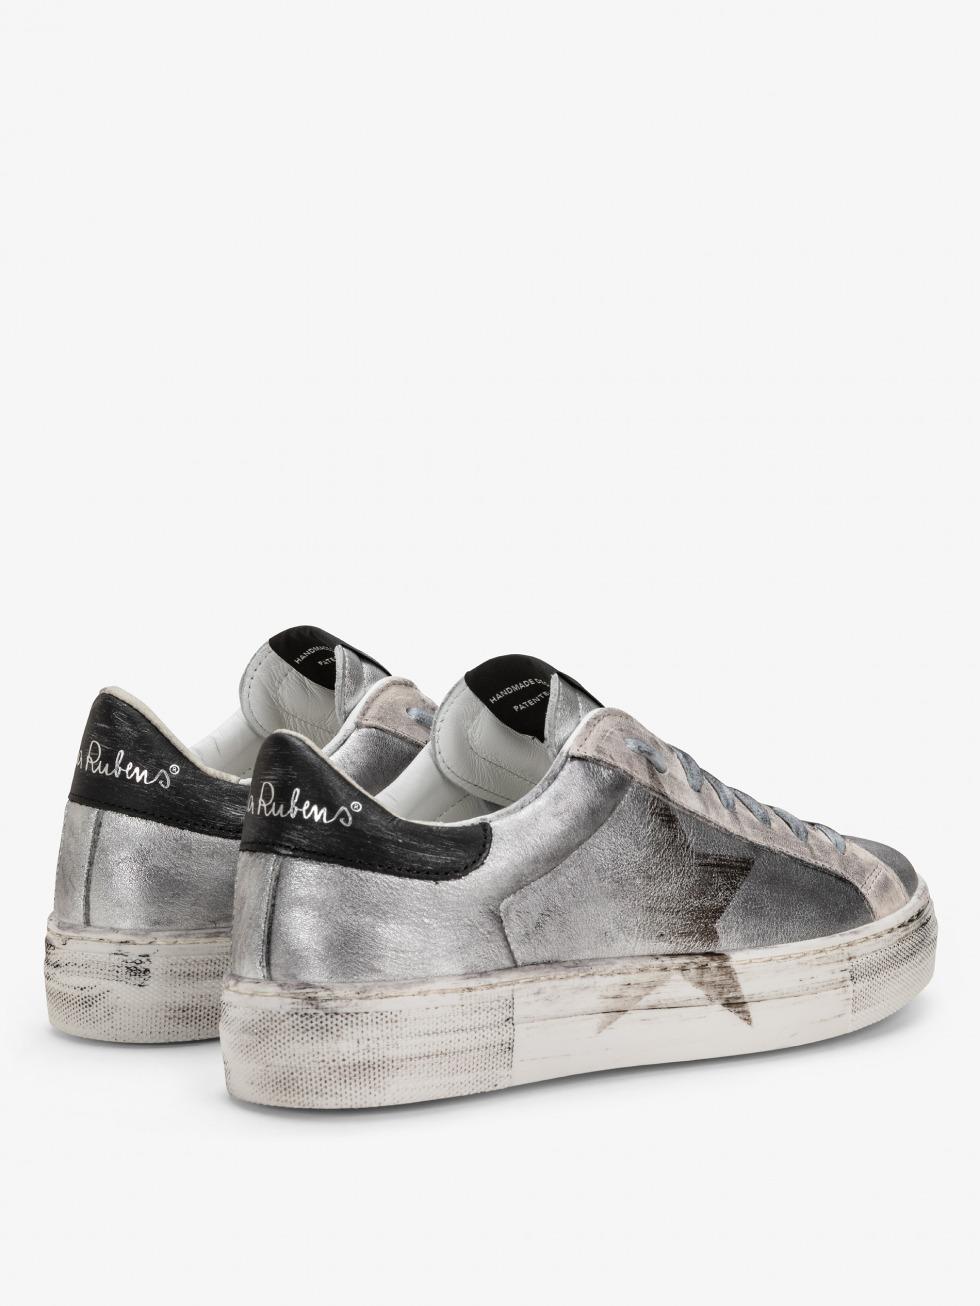 sneakers-in-pelle-donna-martini-vintage-silver-stella (2)